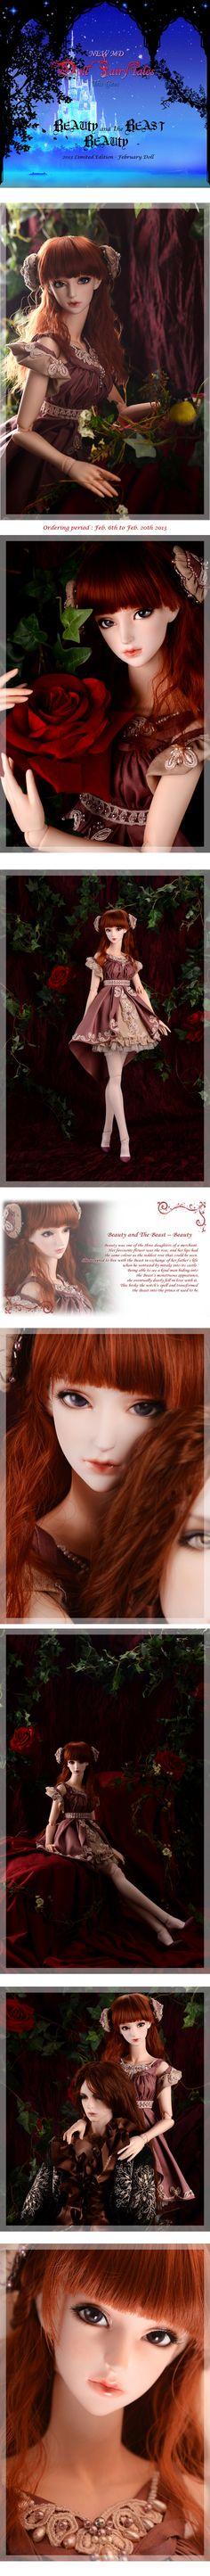 the SOOM emporium Beauty and the Beast #bjd